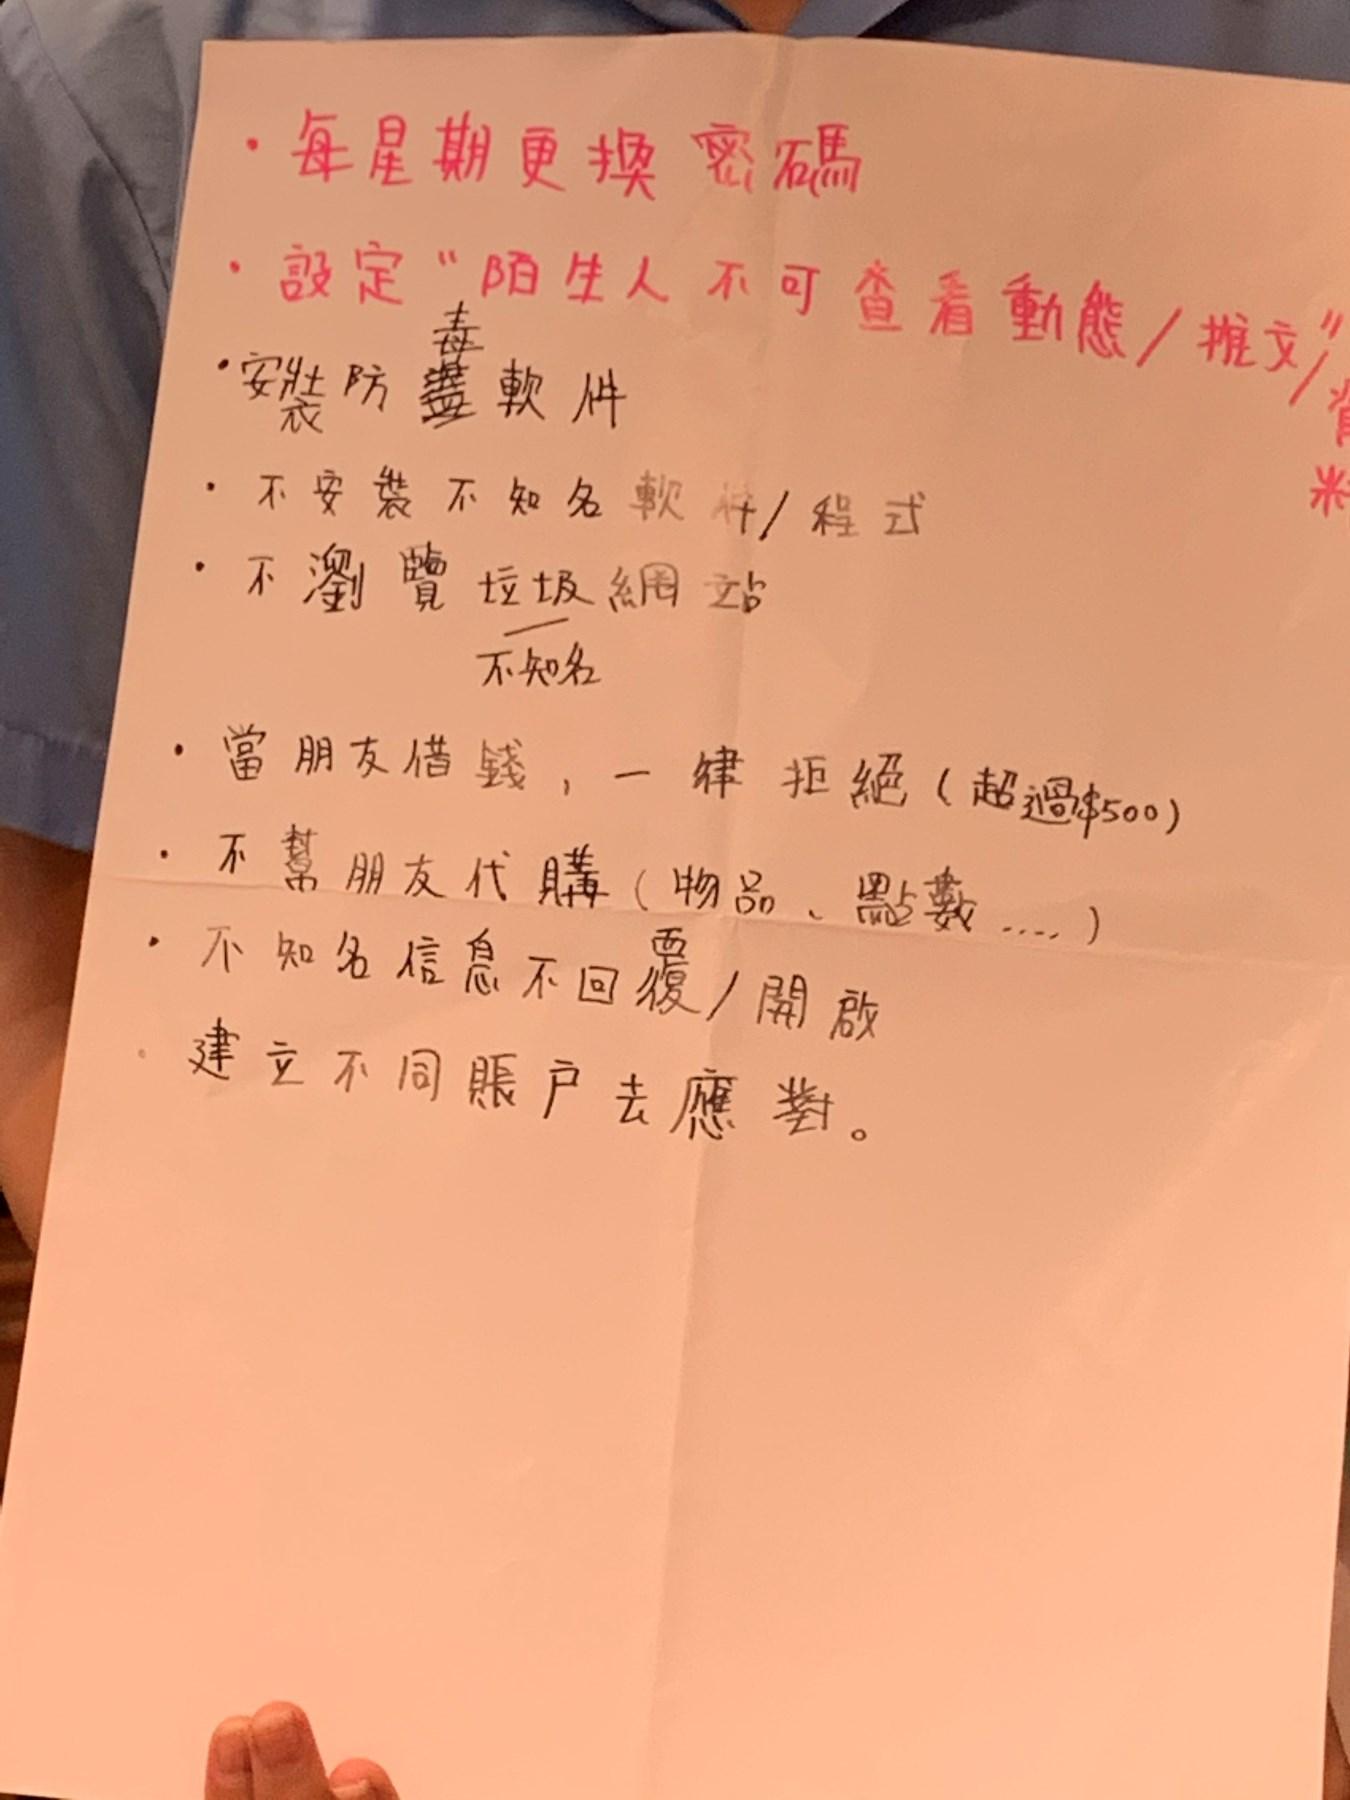 https://npc.edu.hk/sites/default/files/img_1304_1.jpg